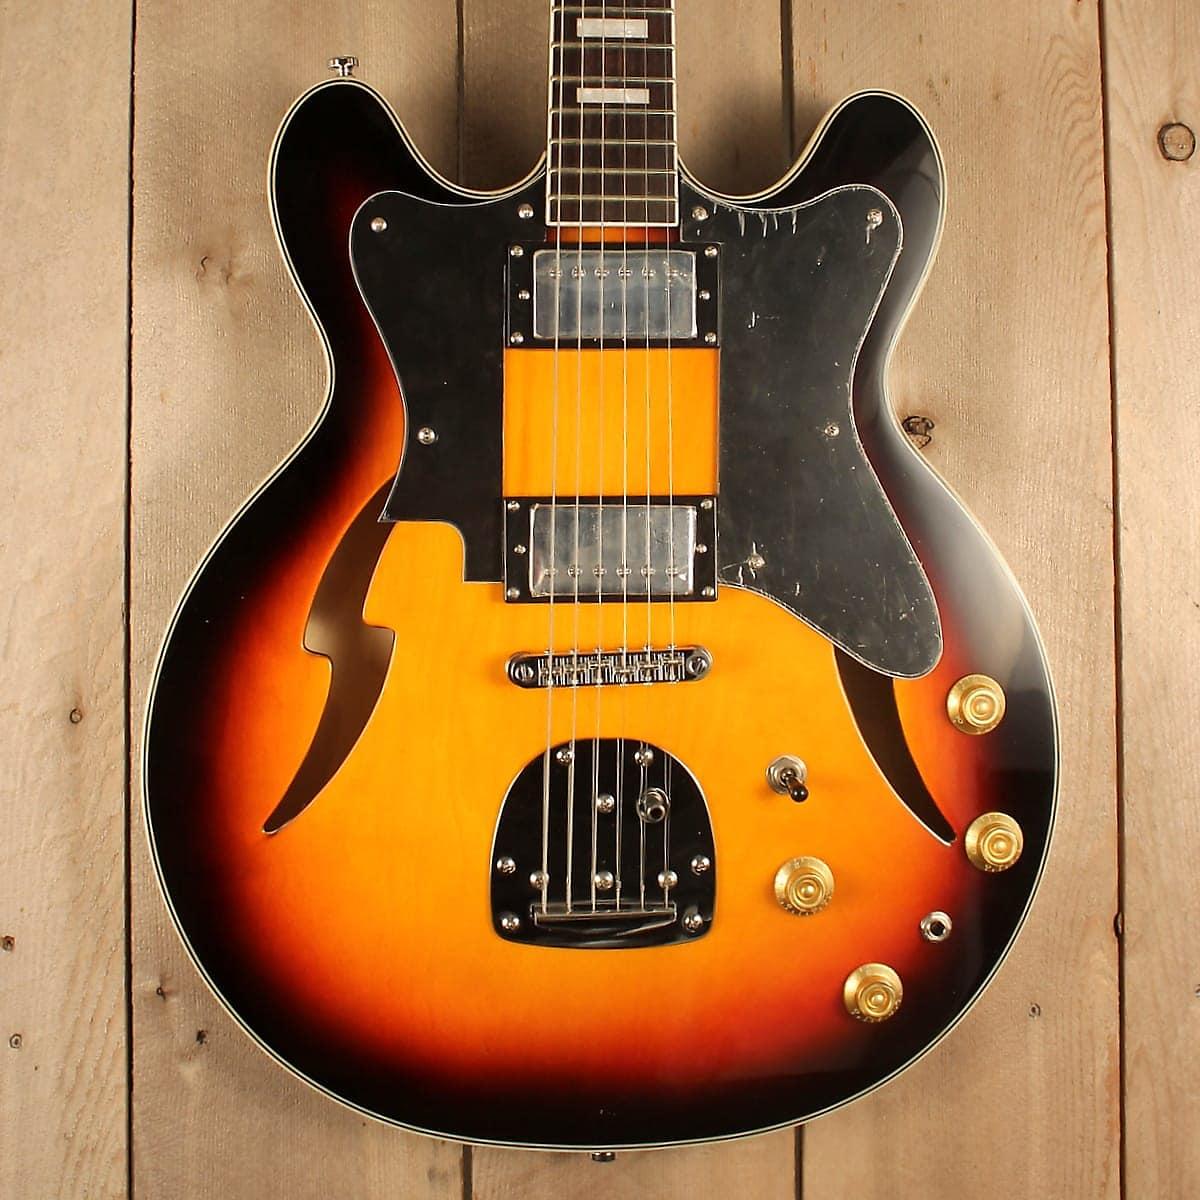 Custom Kraft DLX Guitar - Sunburst - by Eastwood - Supro / Valco Tribute  Model